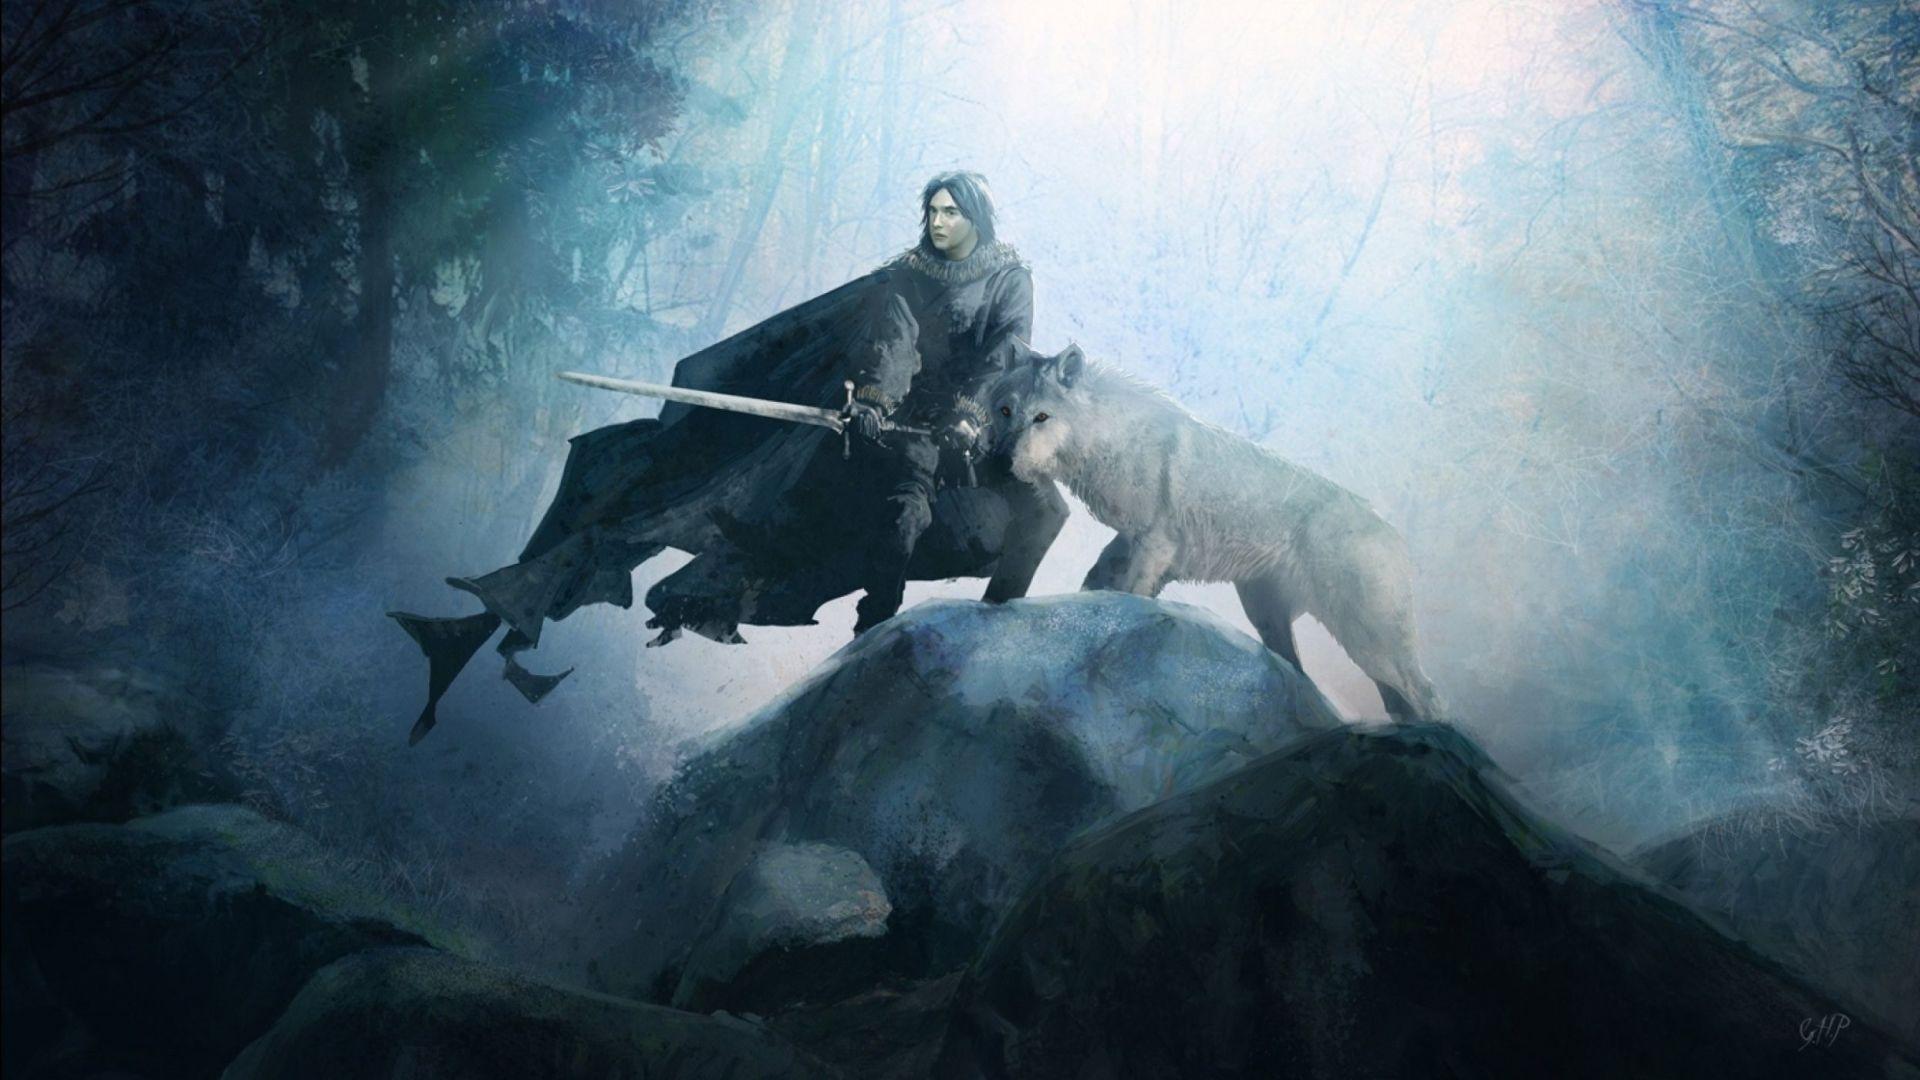 Game of Thrones art